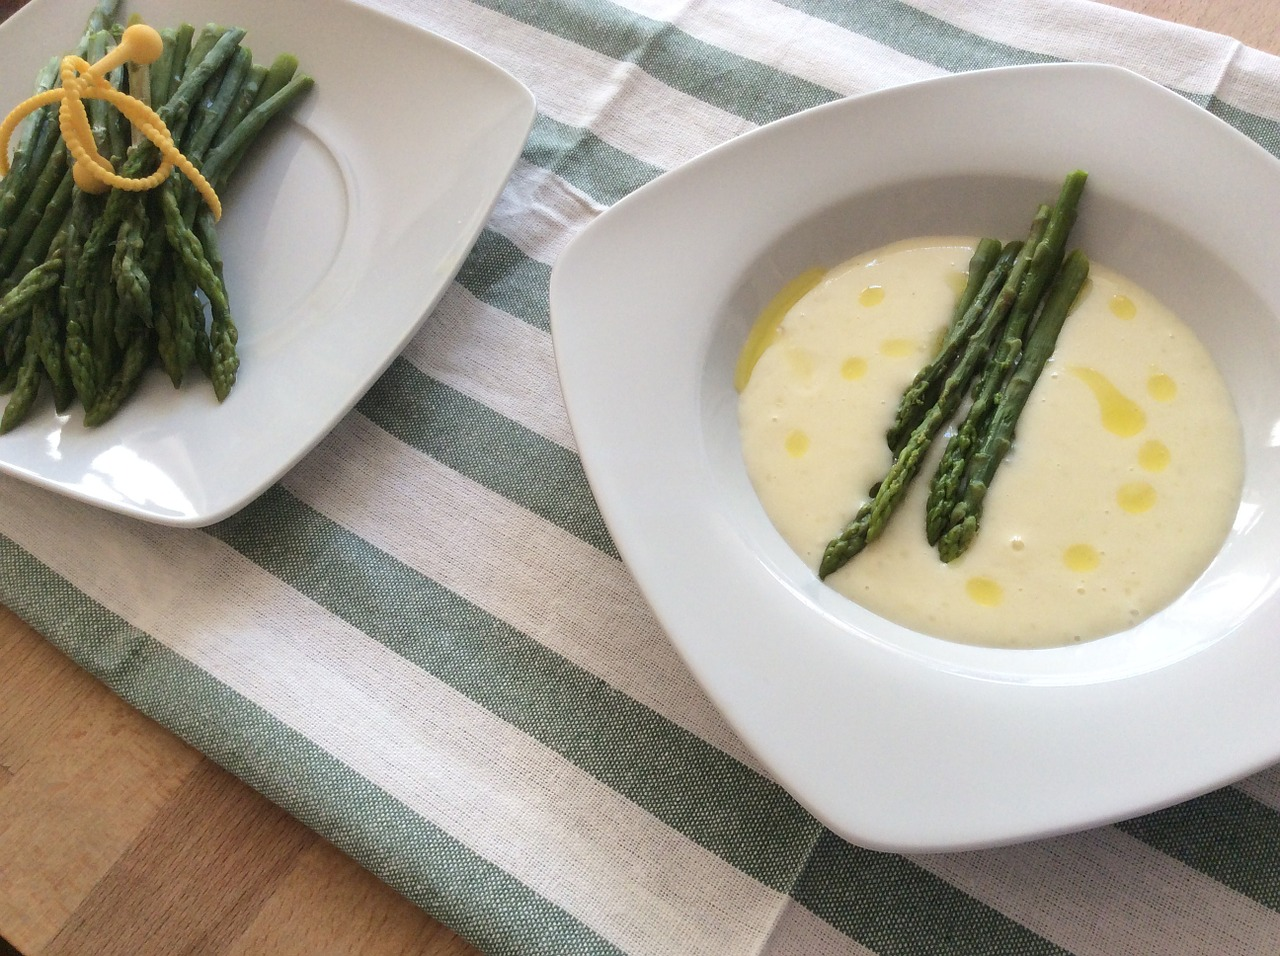 Cum se prepara supa anti imbatranire. Ingrediente simple cunoscute pentru beneficiile lor anti aging